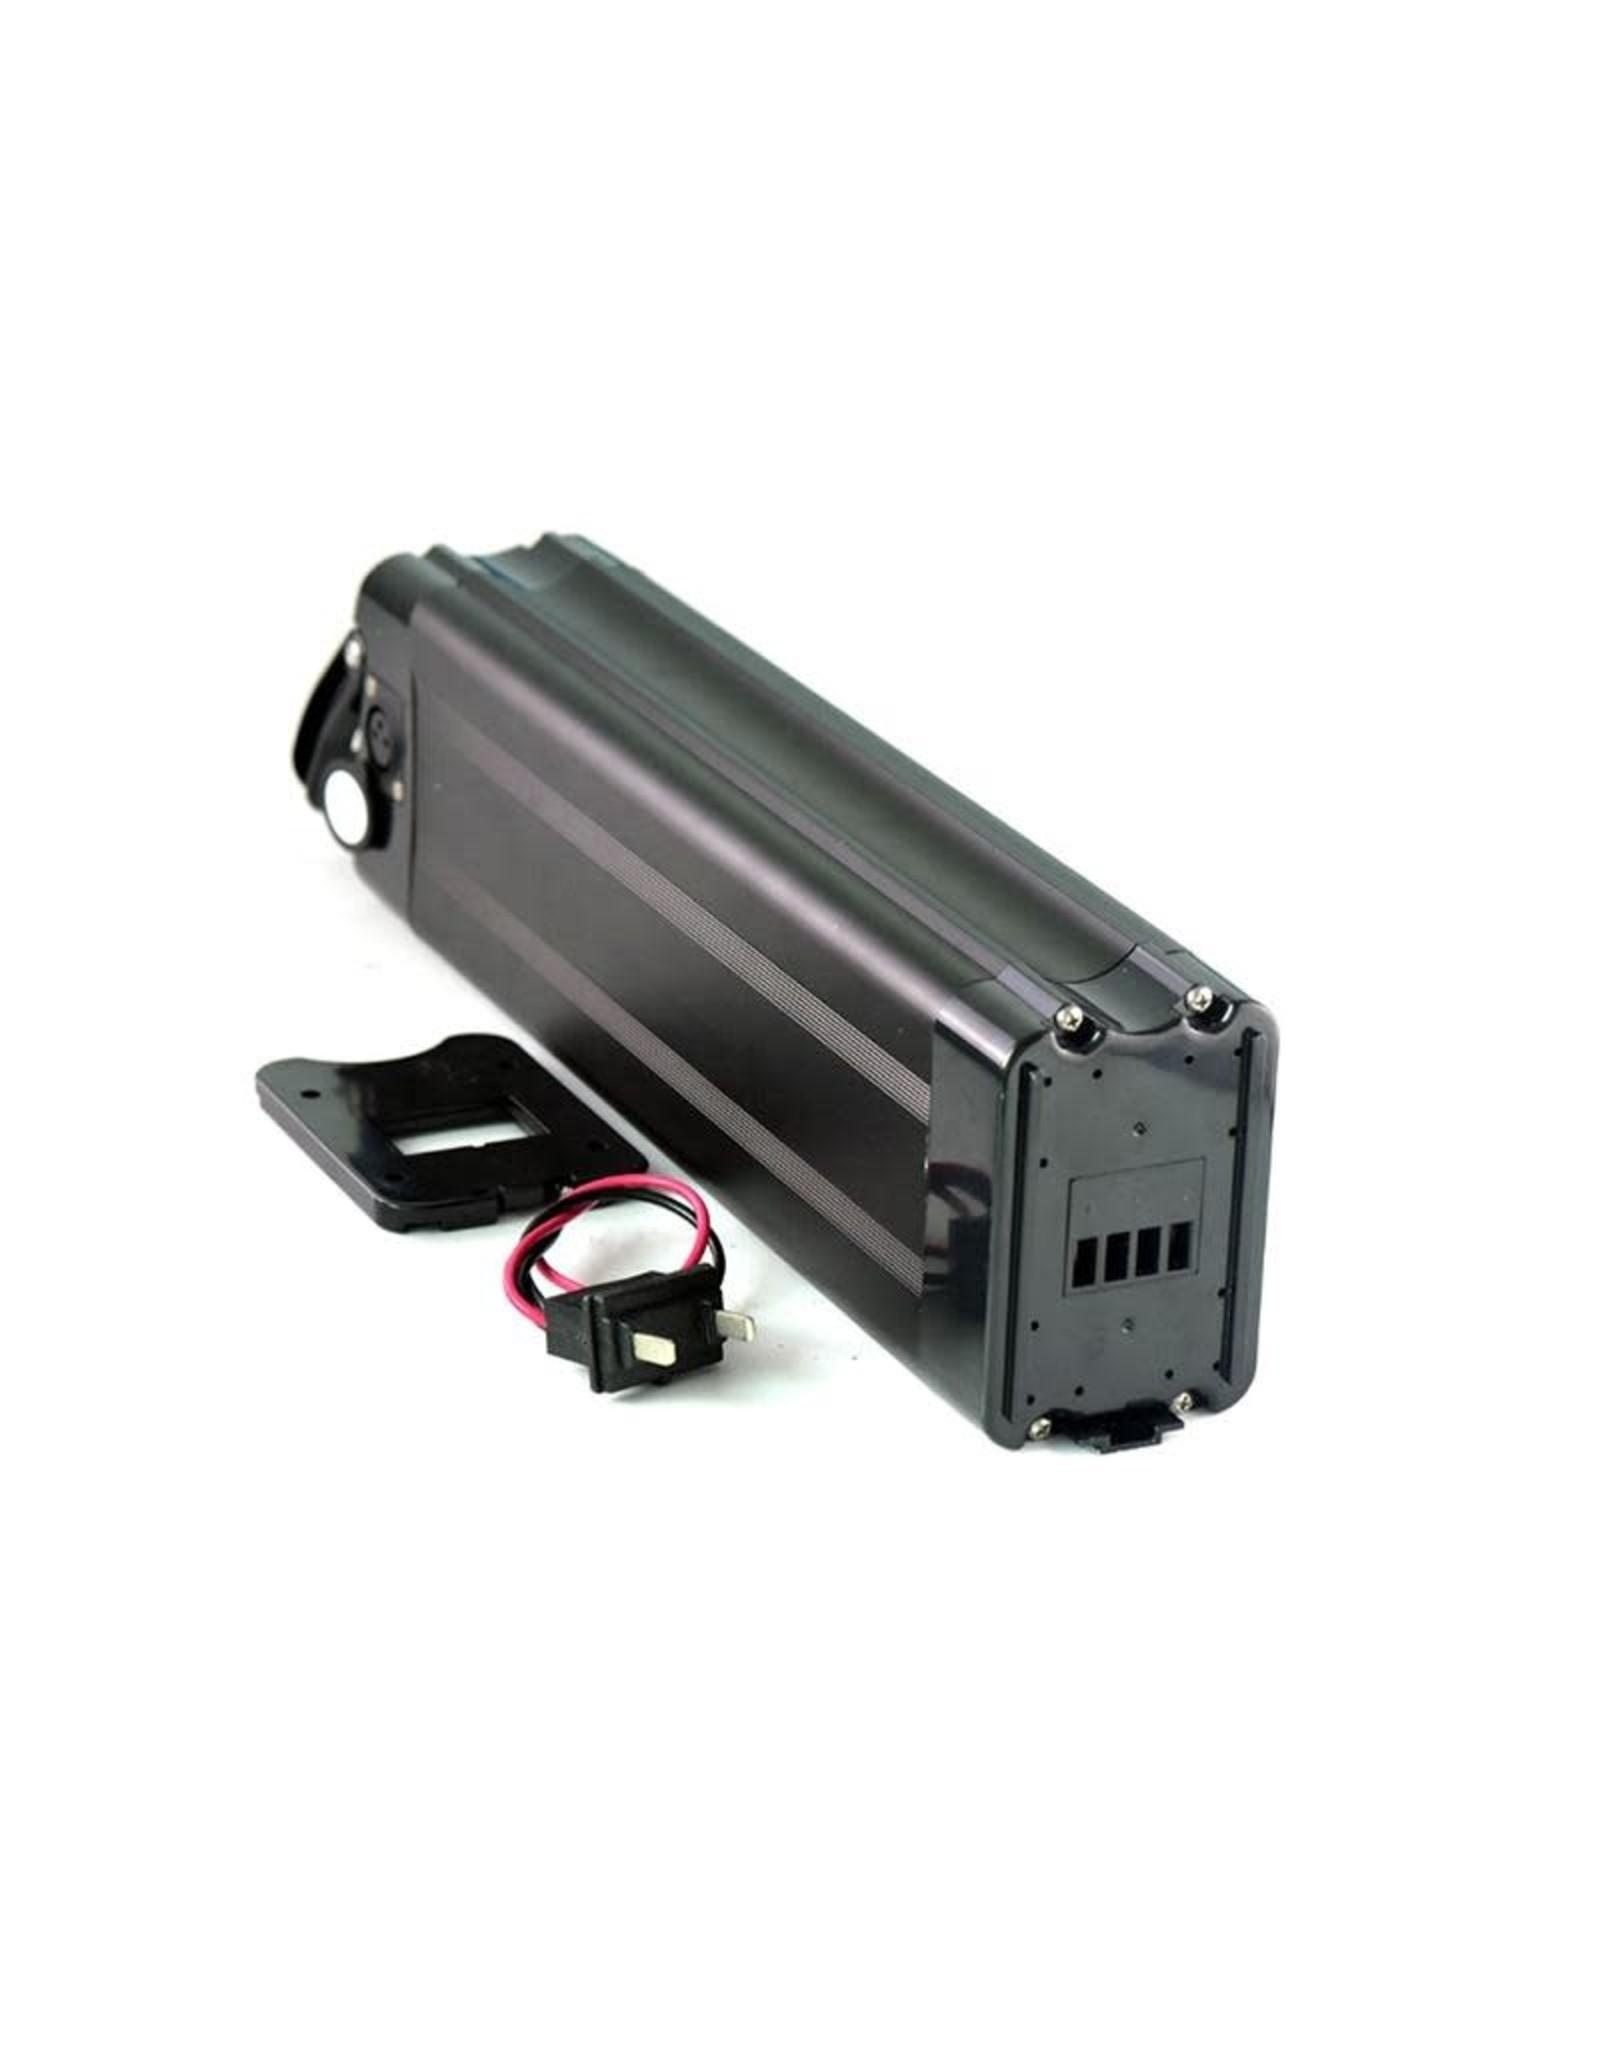 Silverfish battery 36V 12Ah 432Wh black for E-bike